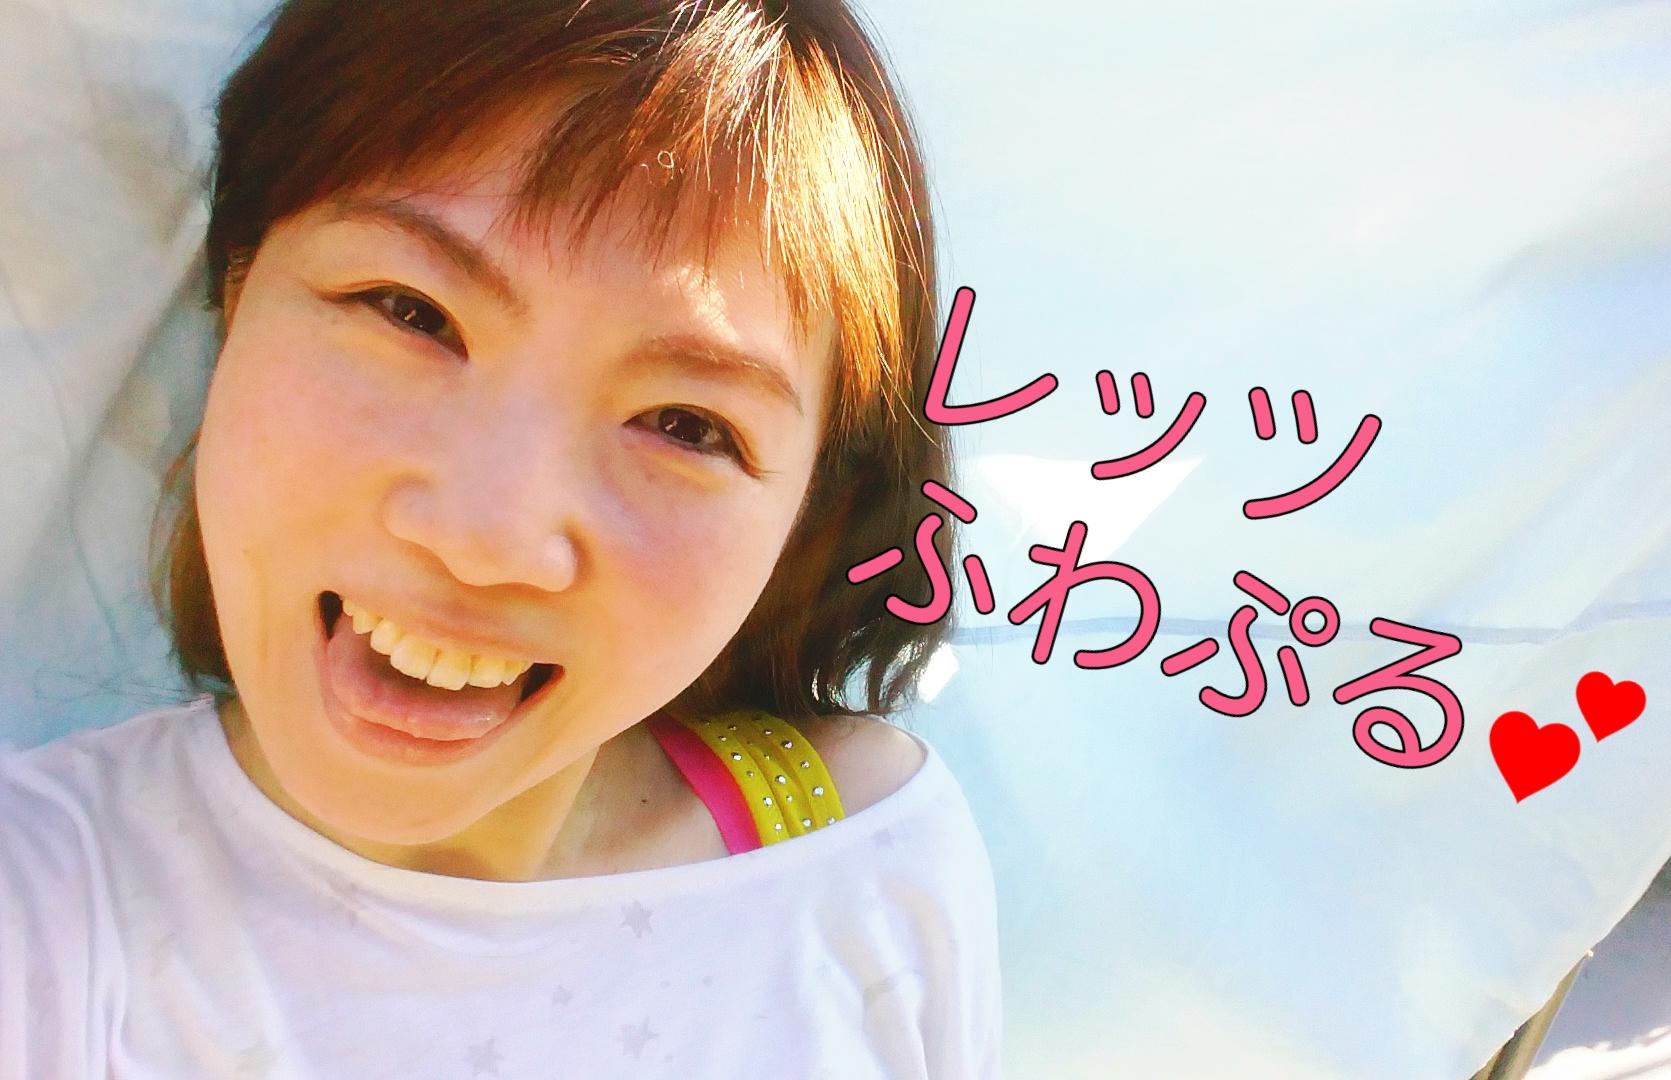 譯懊・螳ョ縺輔i